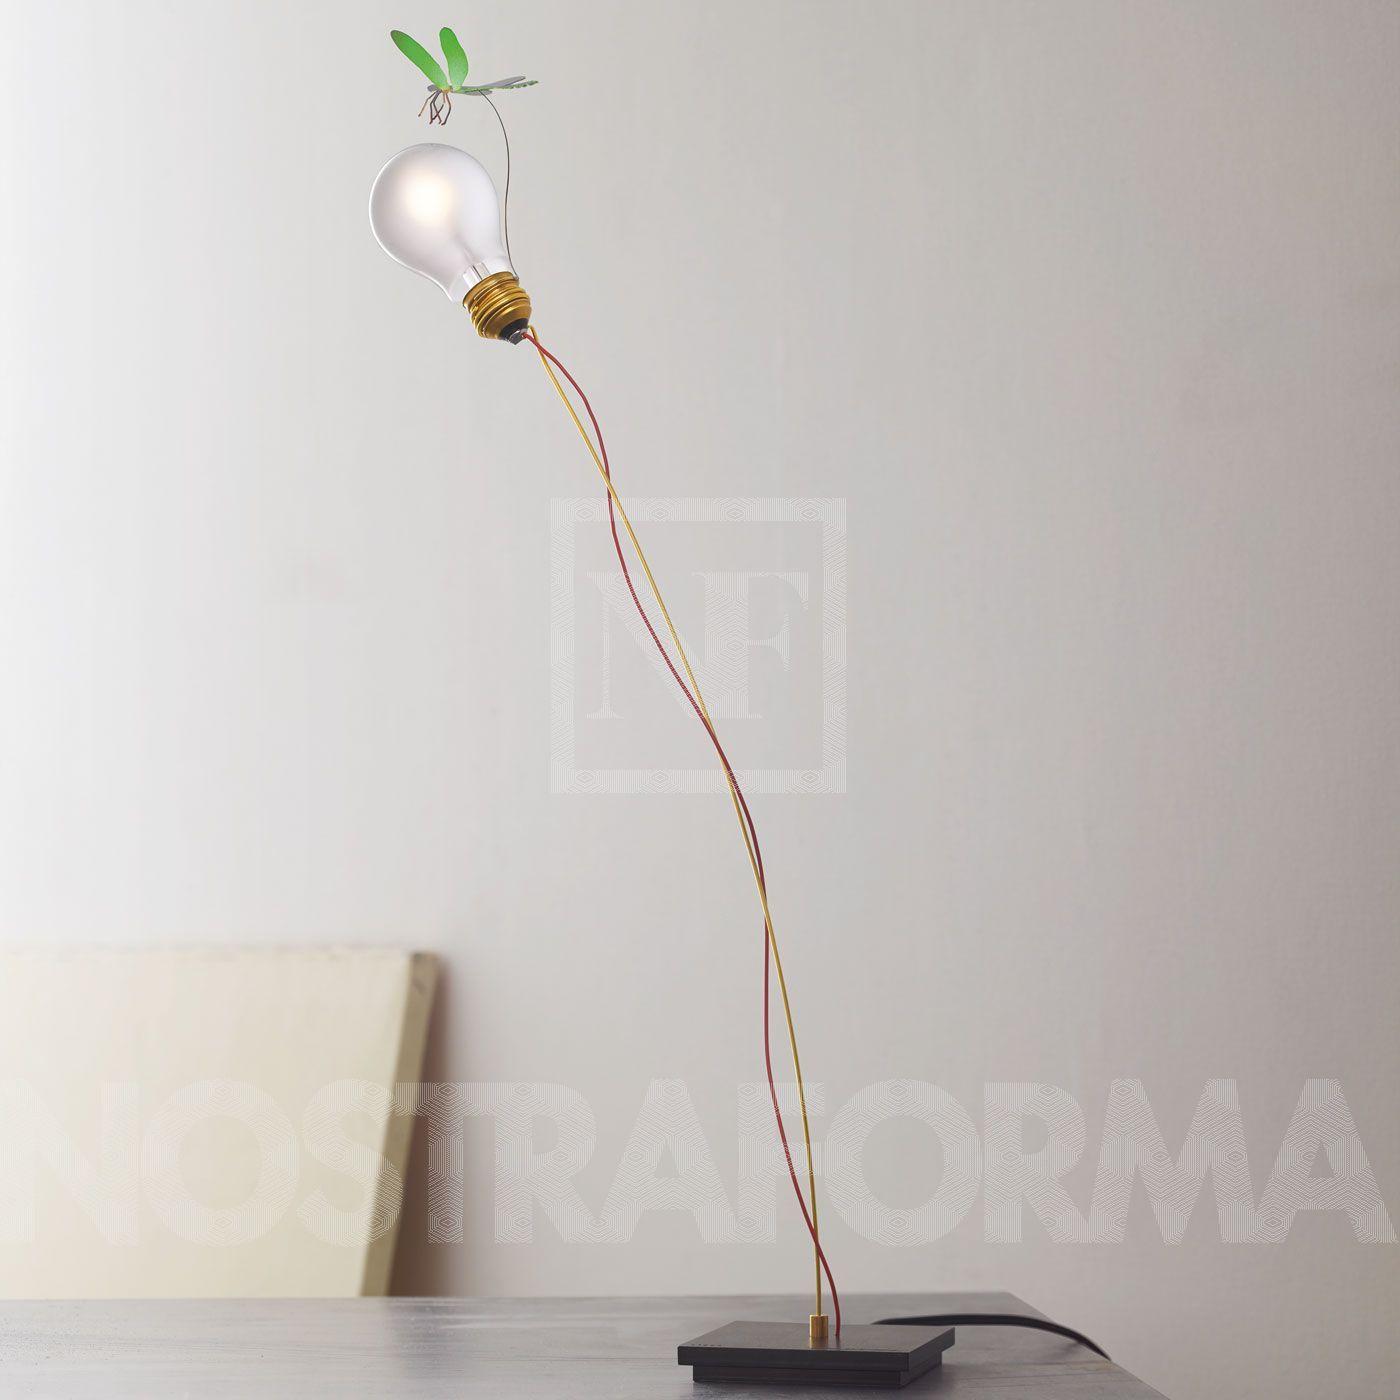 Ingo Maurer I Ricchi Poveri bzzzz table lamp »NOSTRAFORMA design Shop for Lighting